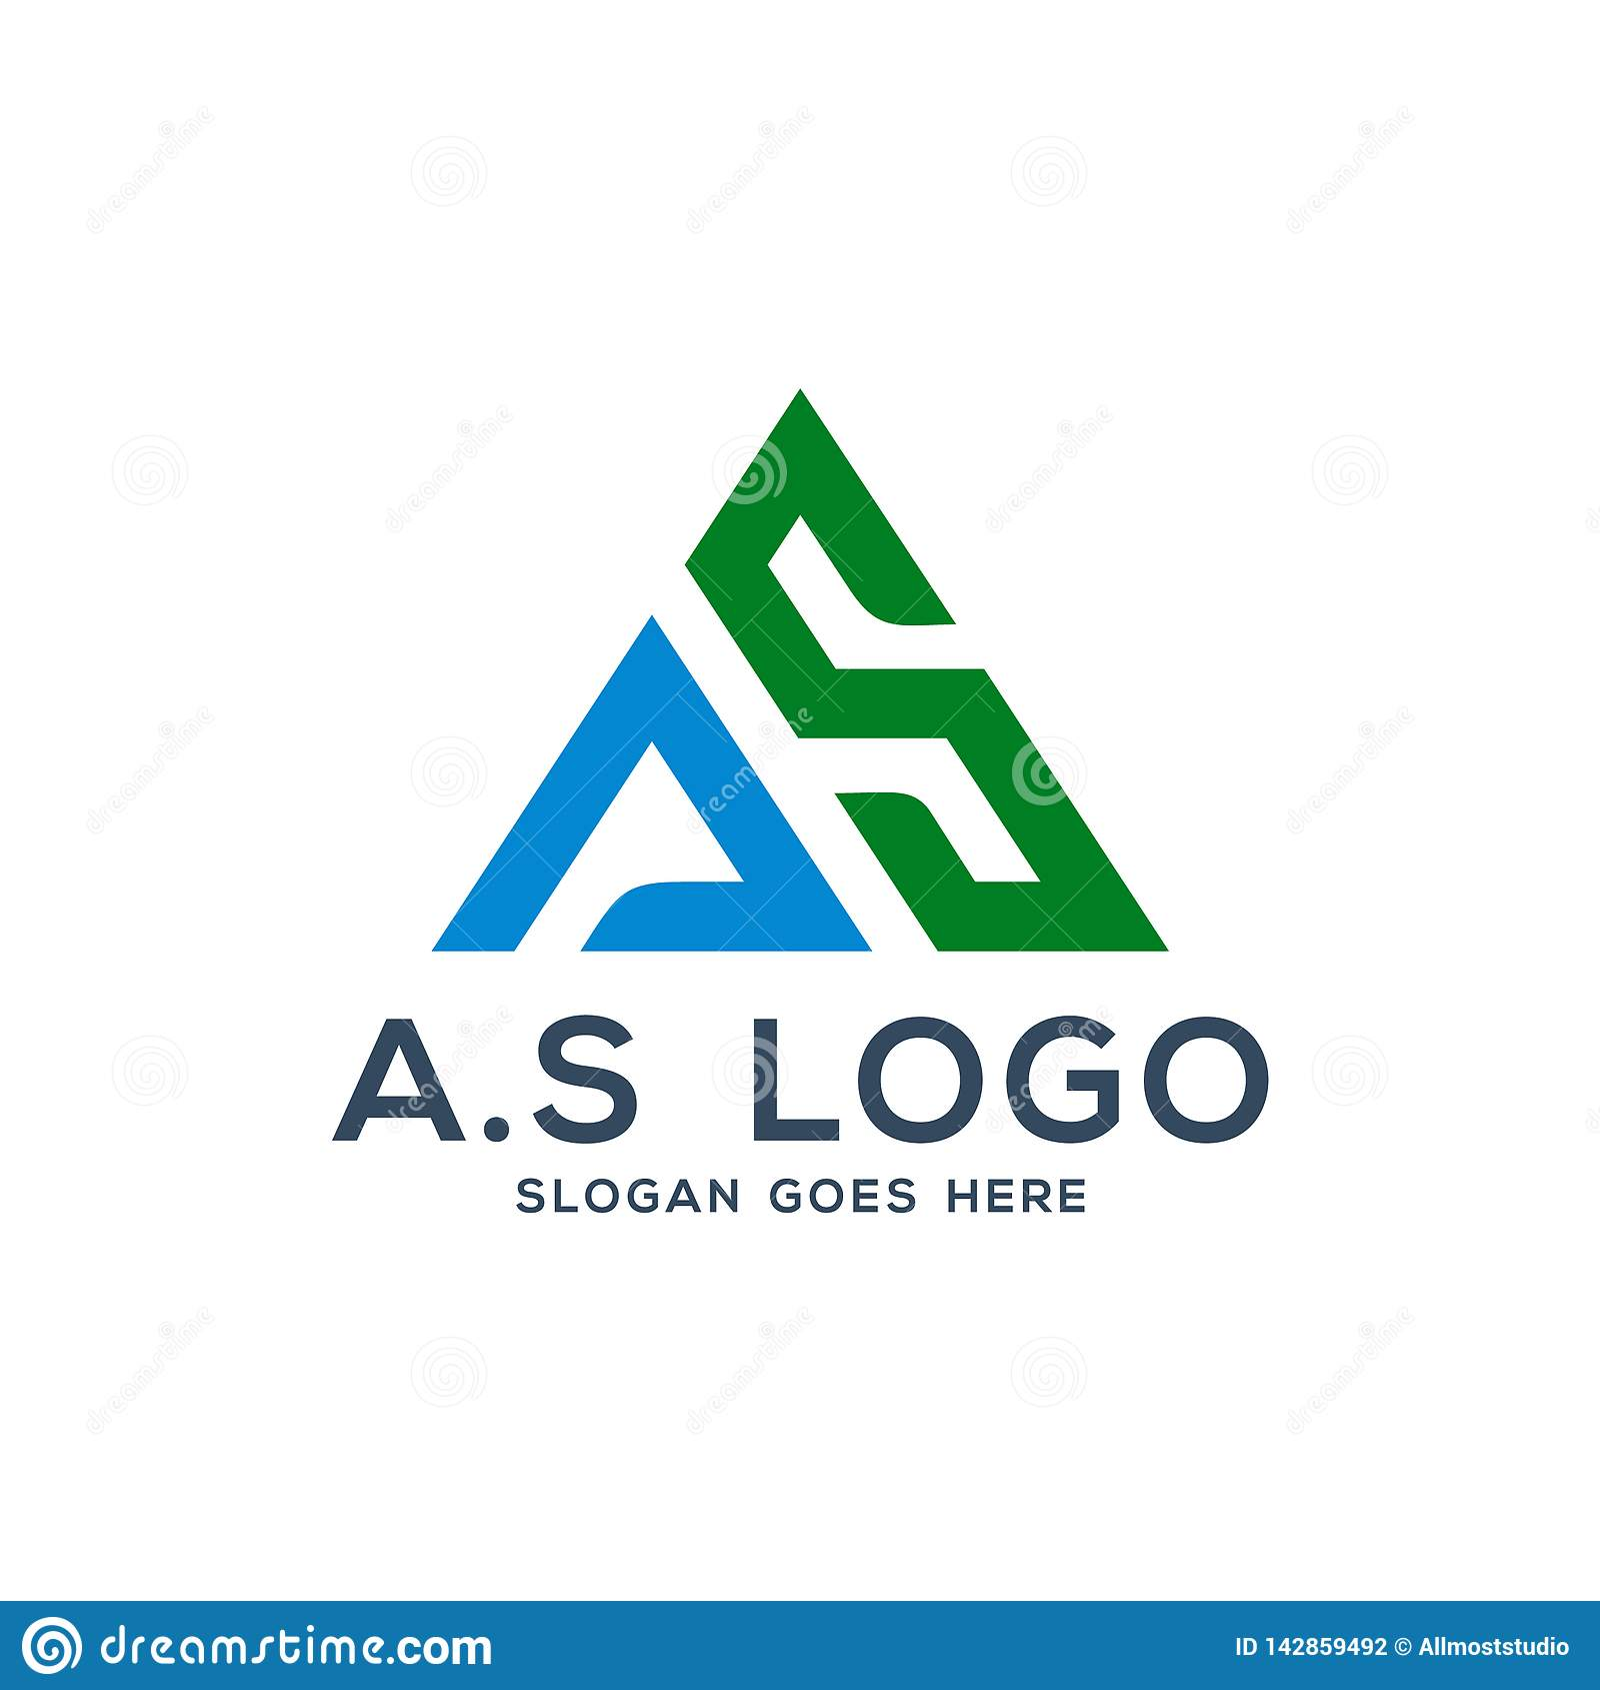 A s商标concep,标注姓名起首字母如同说明